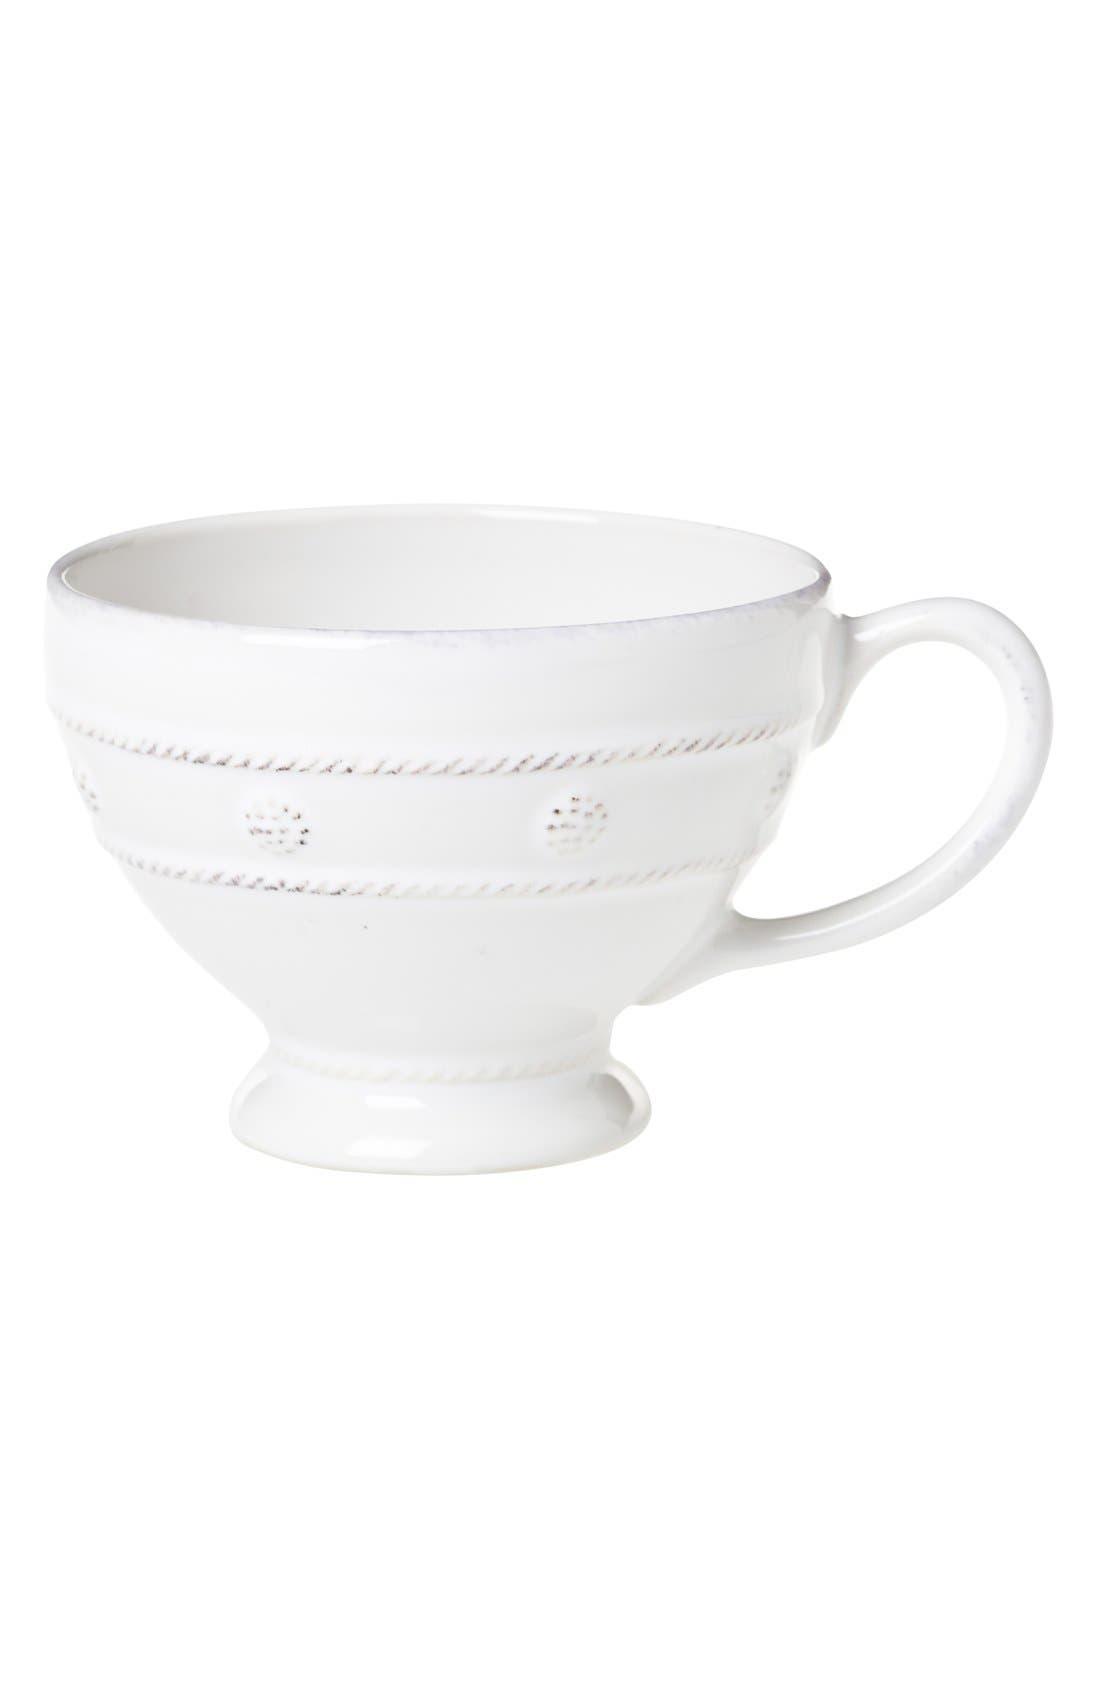 Alternate Image 1 Selected - Juliska'Berry and Thread' CeramicCoffee Mug